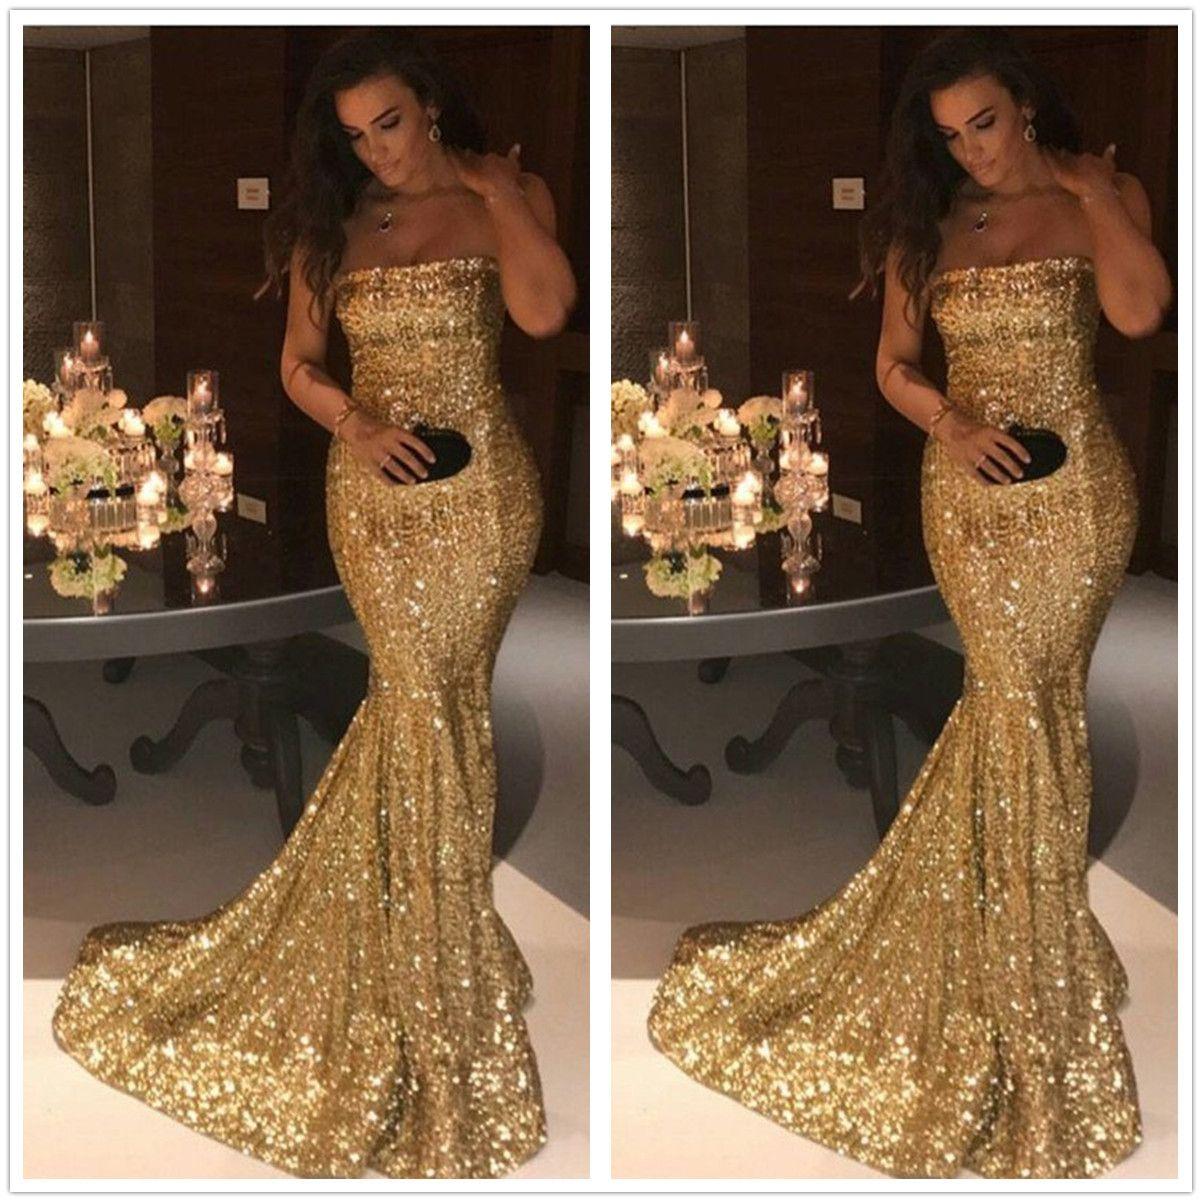 05099d77be146 Golden Strapless Sequined Mermaid Long Prom Dresses 2018 Sleeveless  Sparklng Backless Floor Length Formal Party Evening Dress Von Maur Prom  Dresses White ...